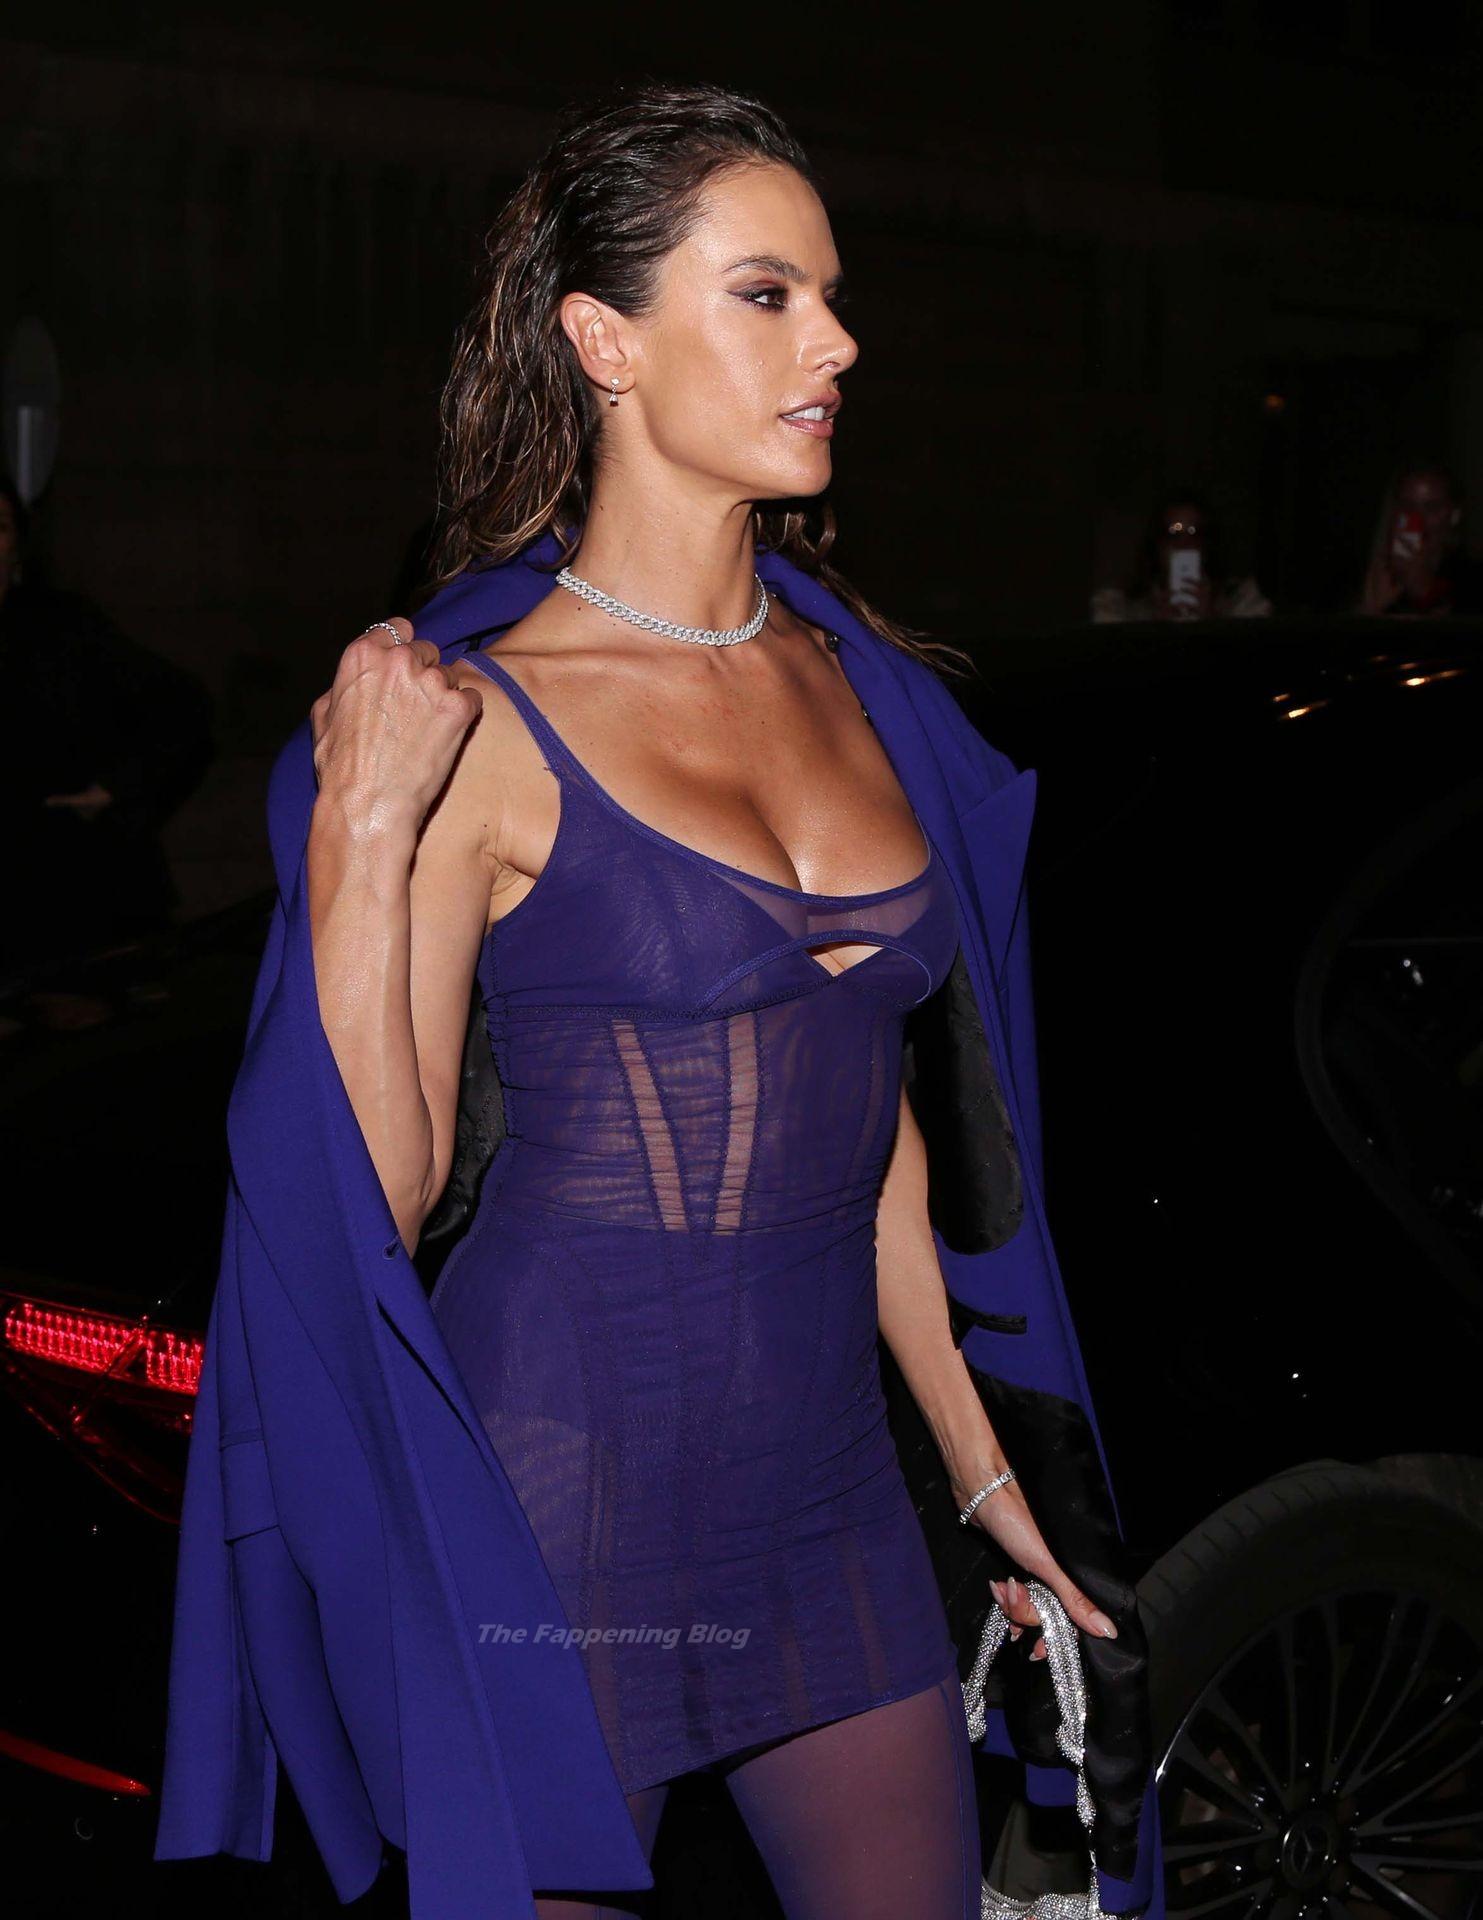 Alessandra-Ambrosio-Sexy-The-Fappening-Blog-45-1.jpg